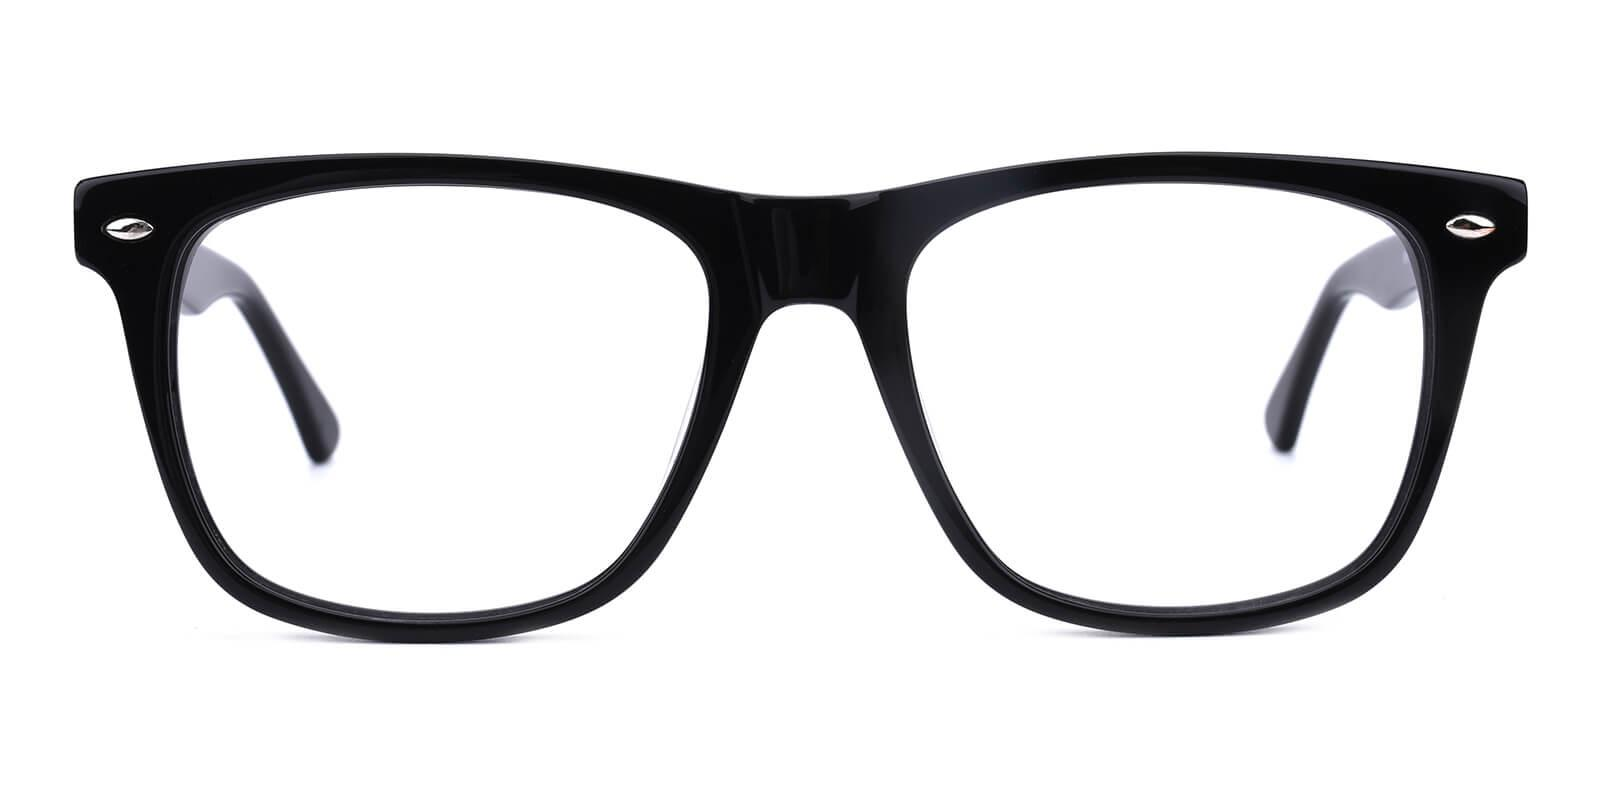 Bridinry-Black-Square-Acetate-Eyeglasses-additional2